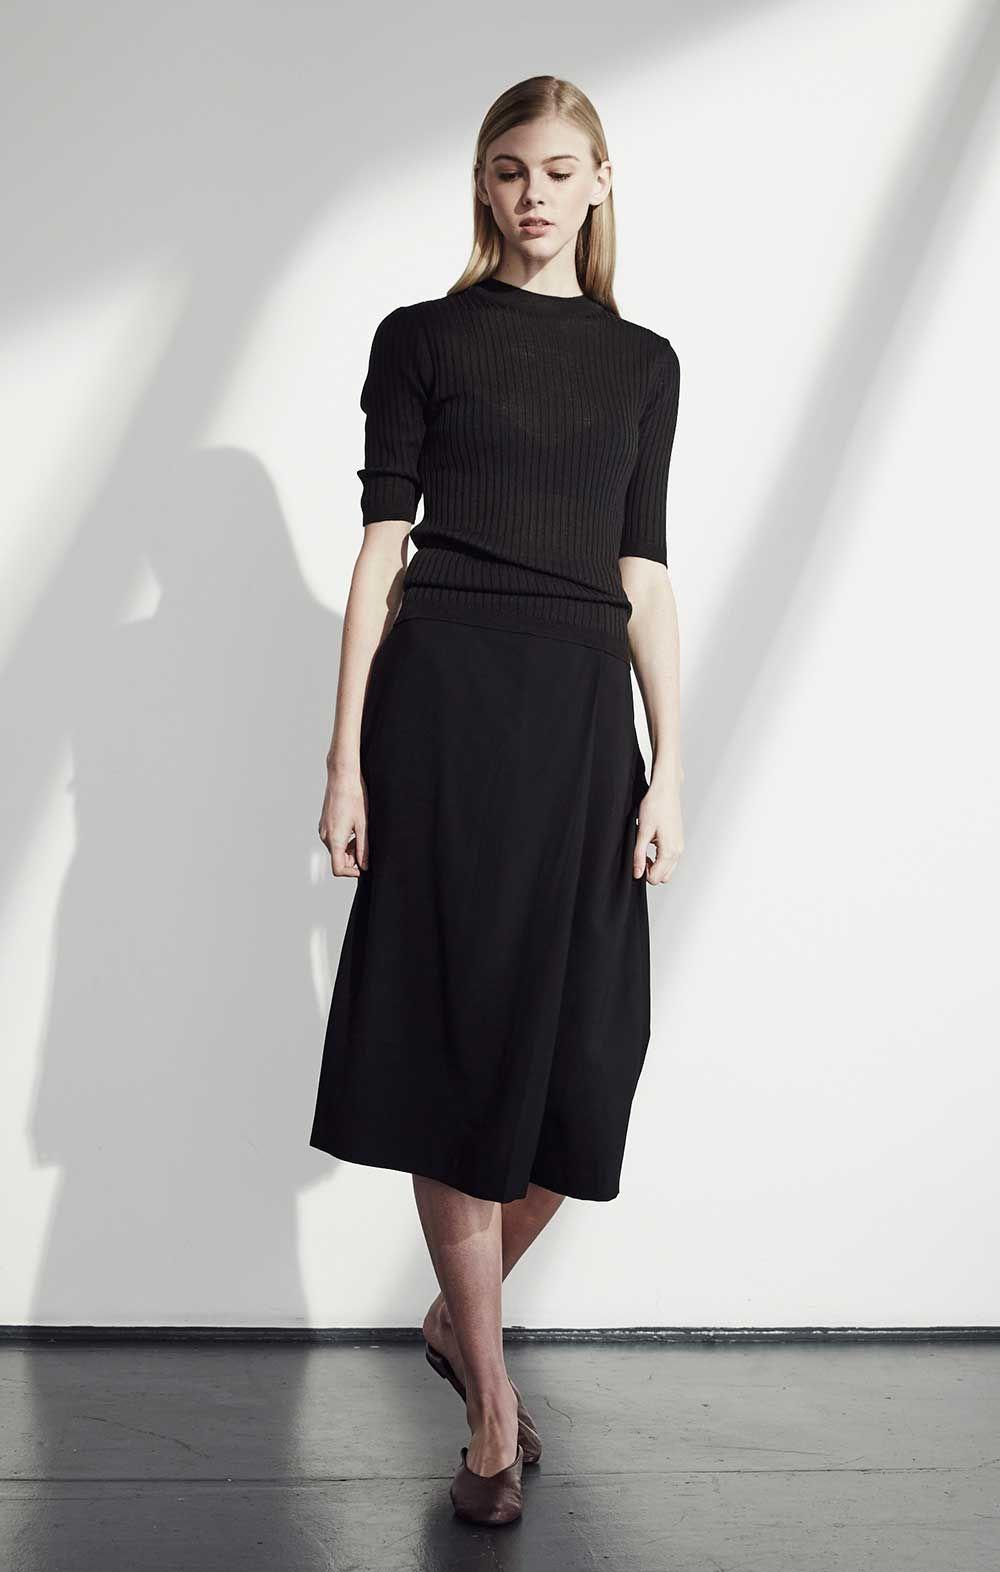 Black t shirt outfit - Black On Black Black Midi Skirt And Black T Shirt Minimalist Work Outfit